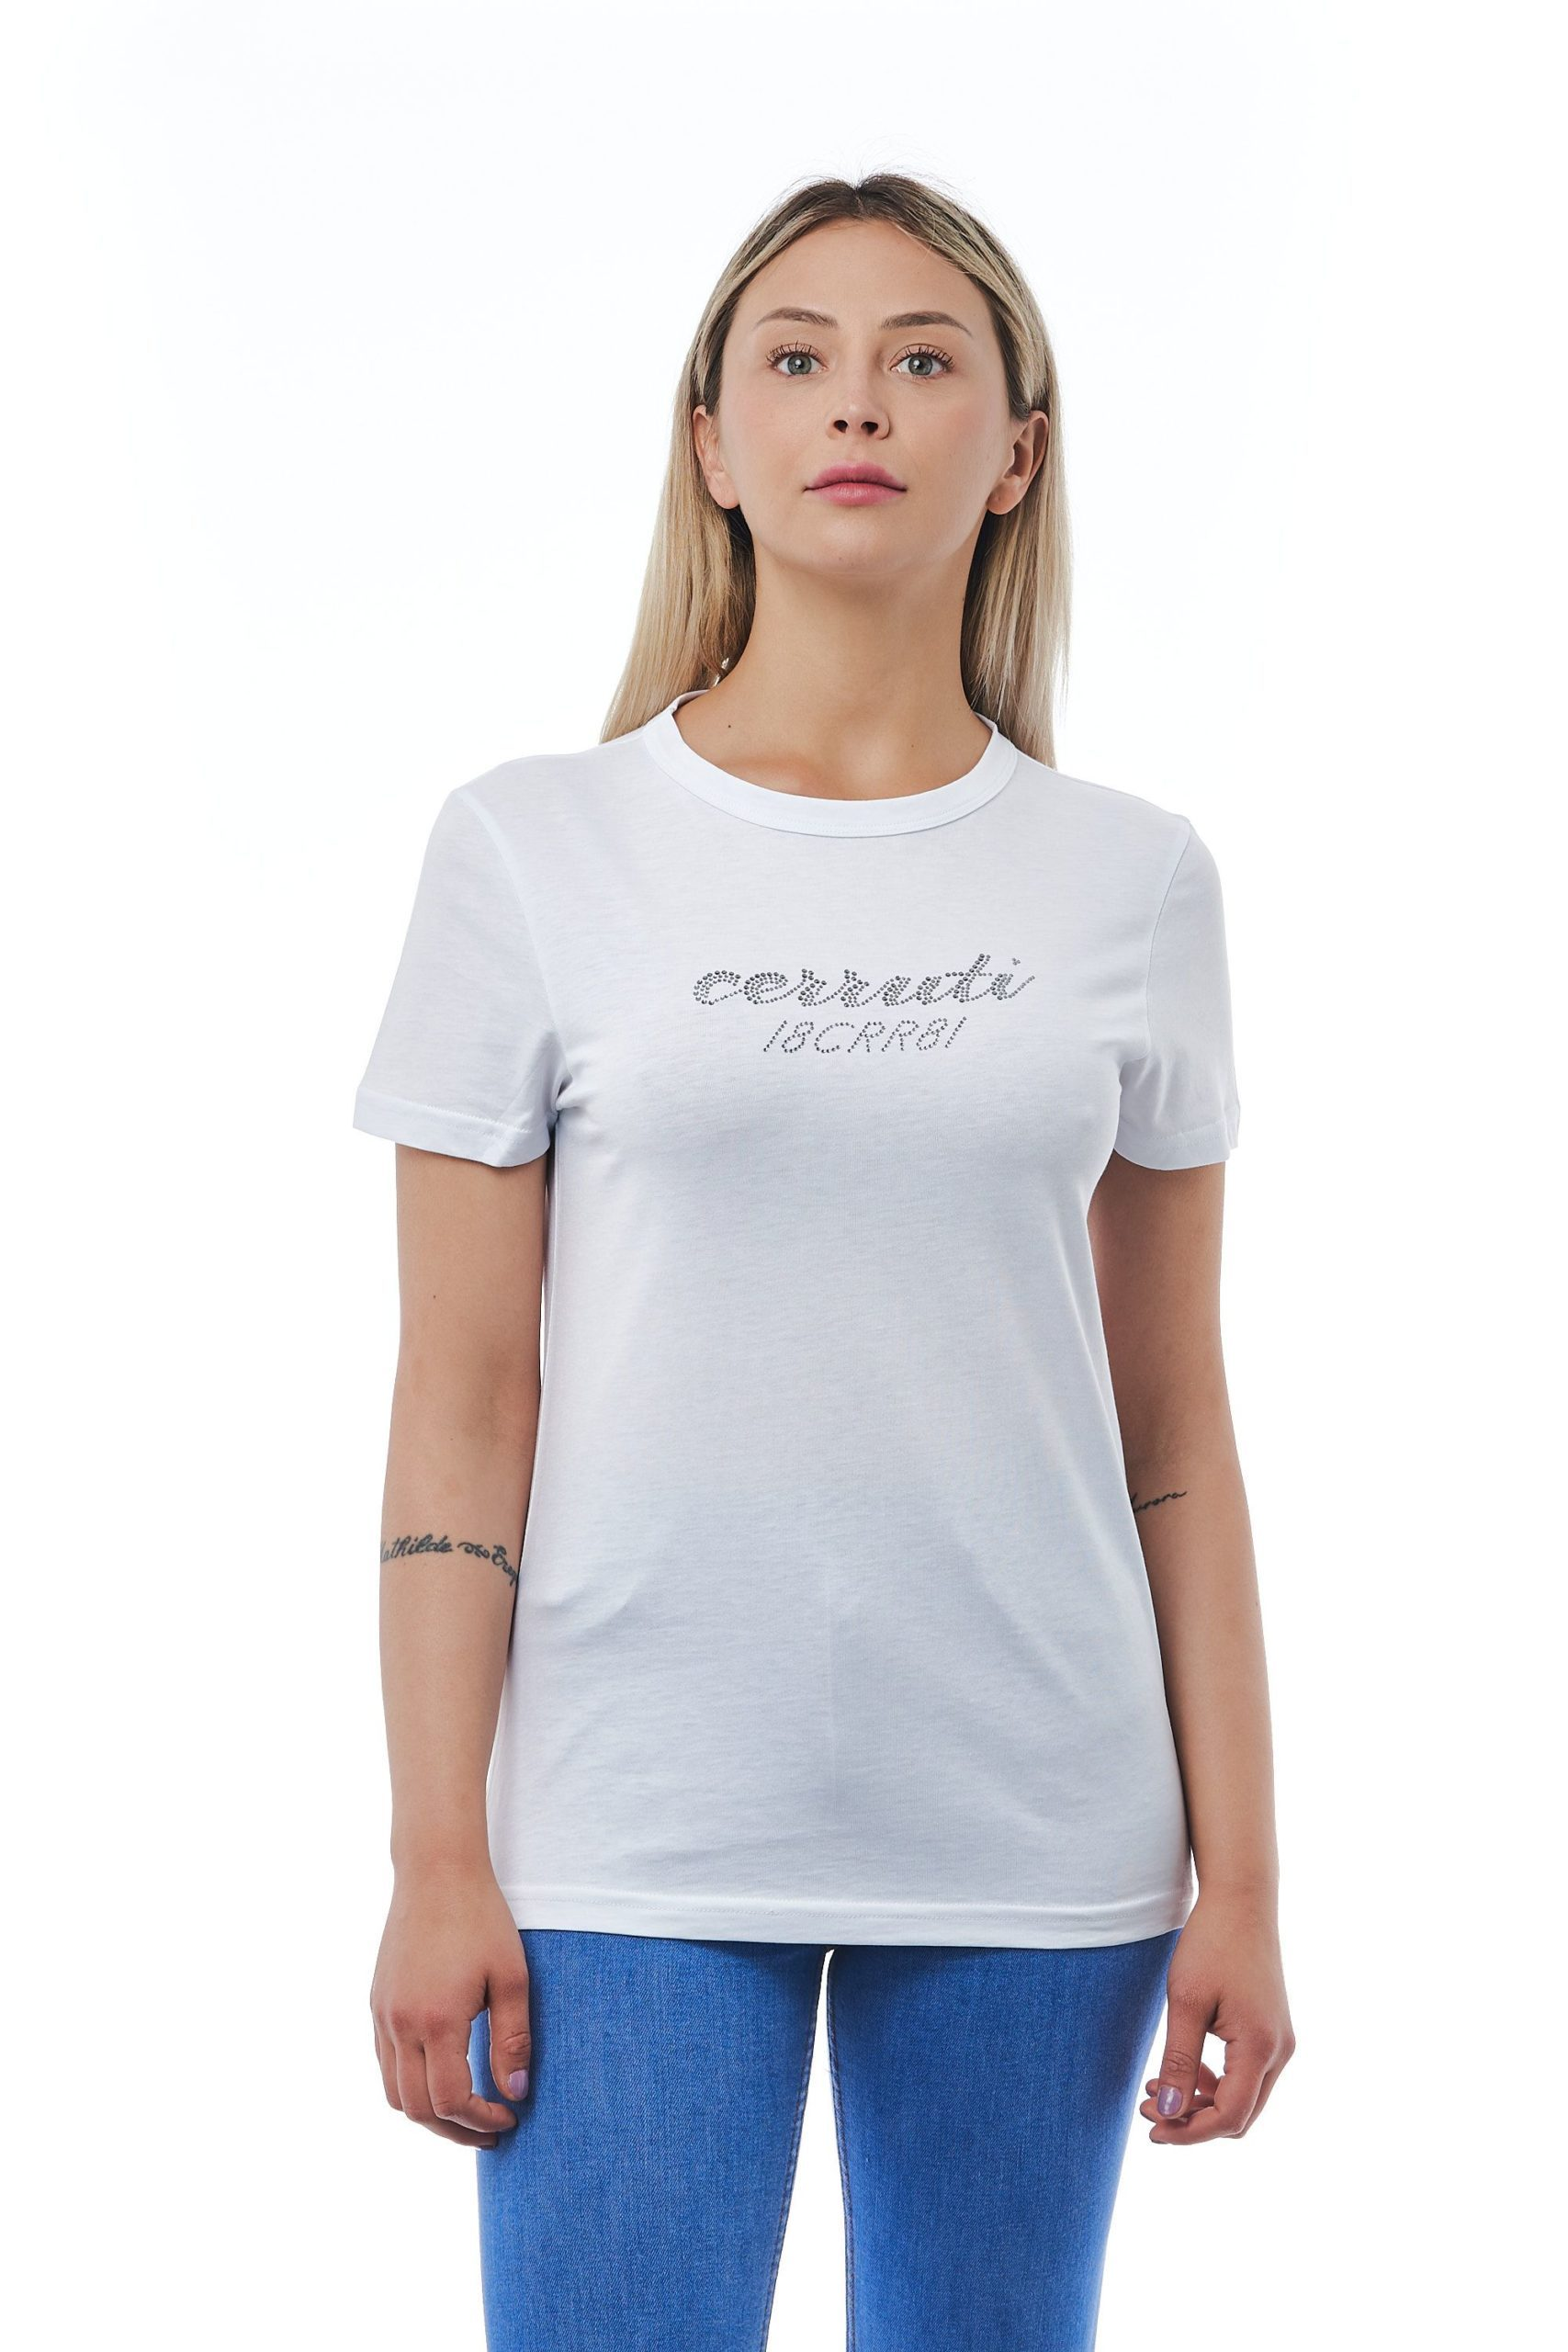 Cerruti 1881 Women's Bianco T-Shirt White CE1410231 - M